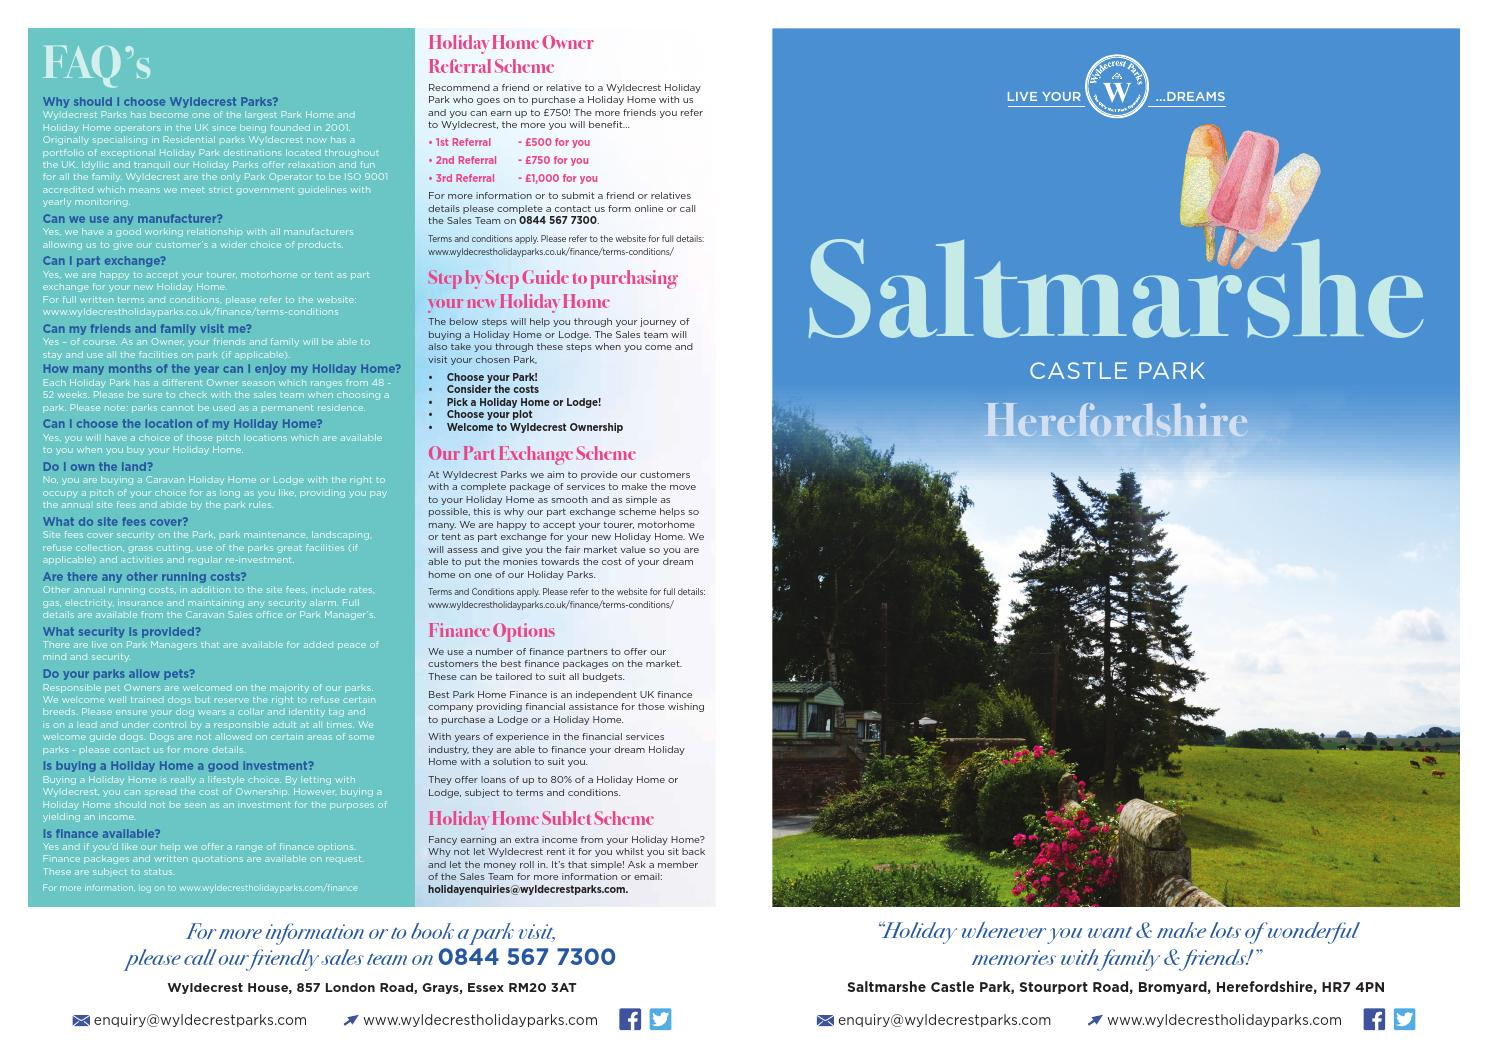 Saltmarshe Castle Park Brochure By Wyldecrest Parks